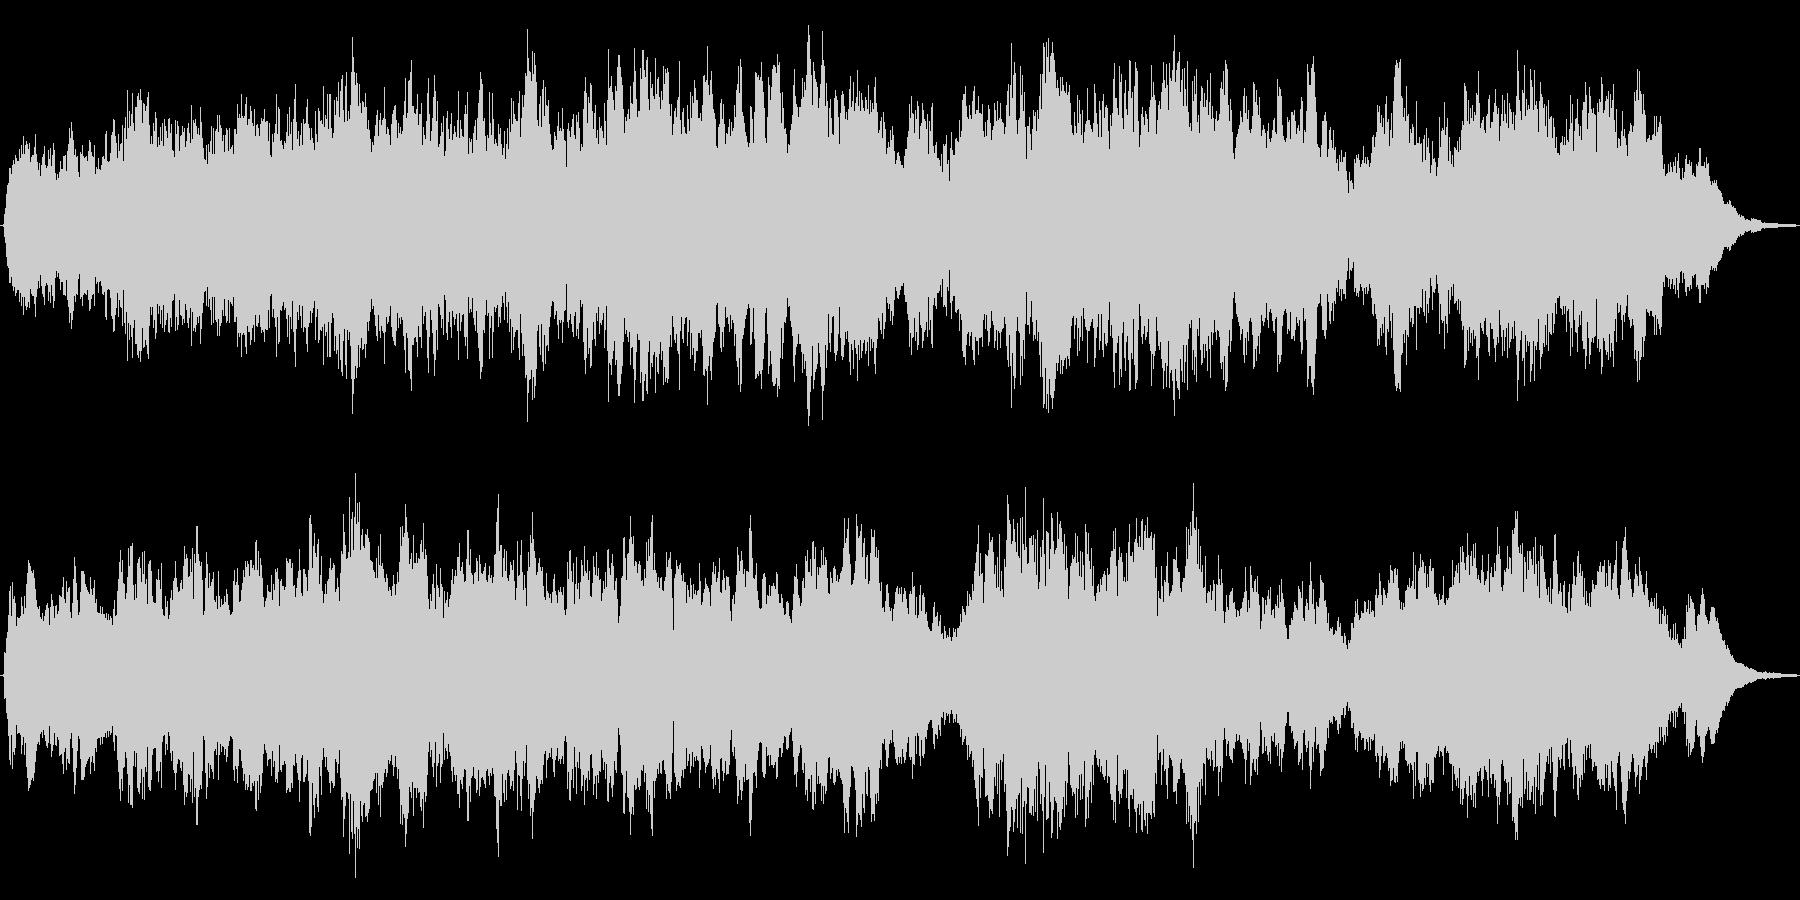 G線上のアリア・優雅な弦楽合奏30sの未再生の波形